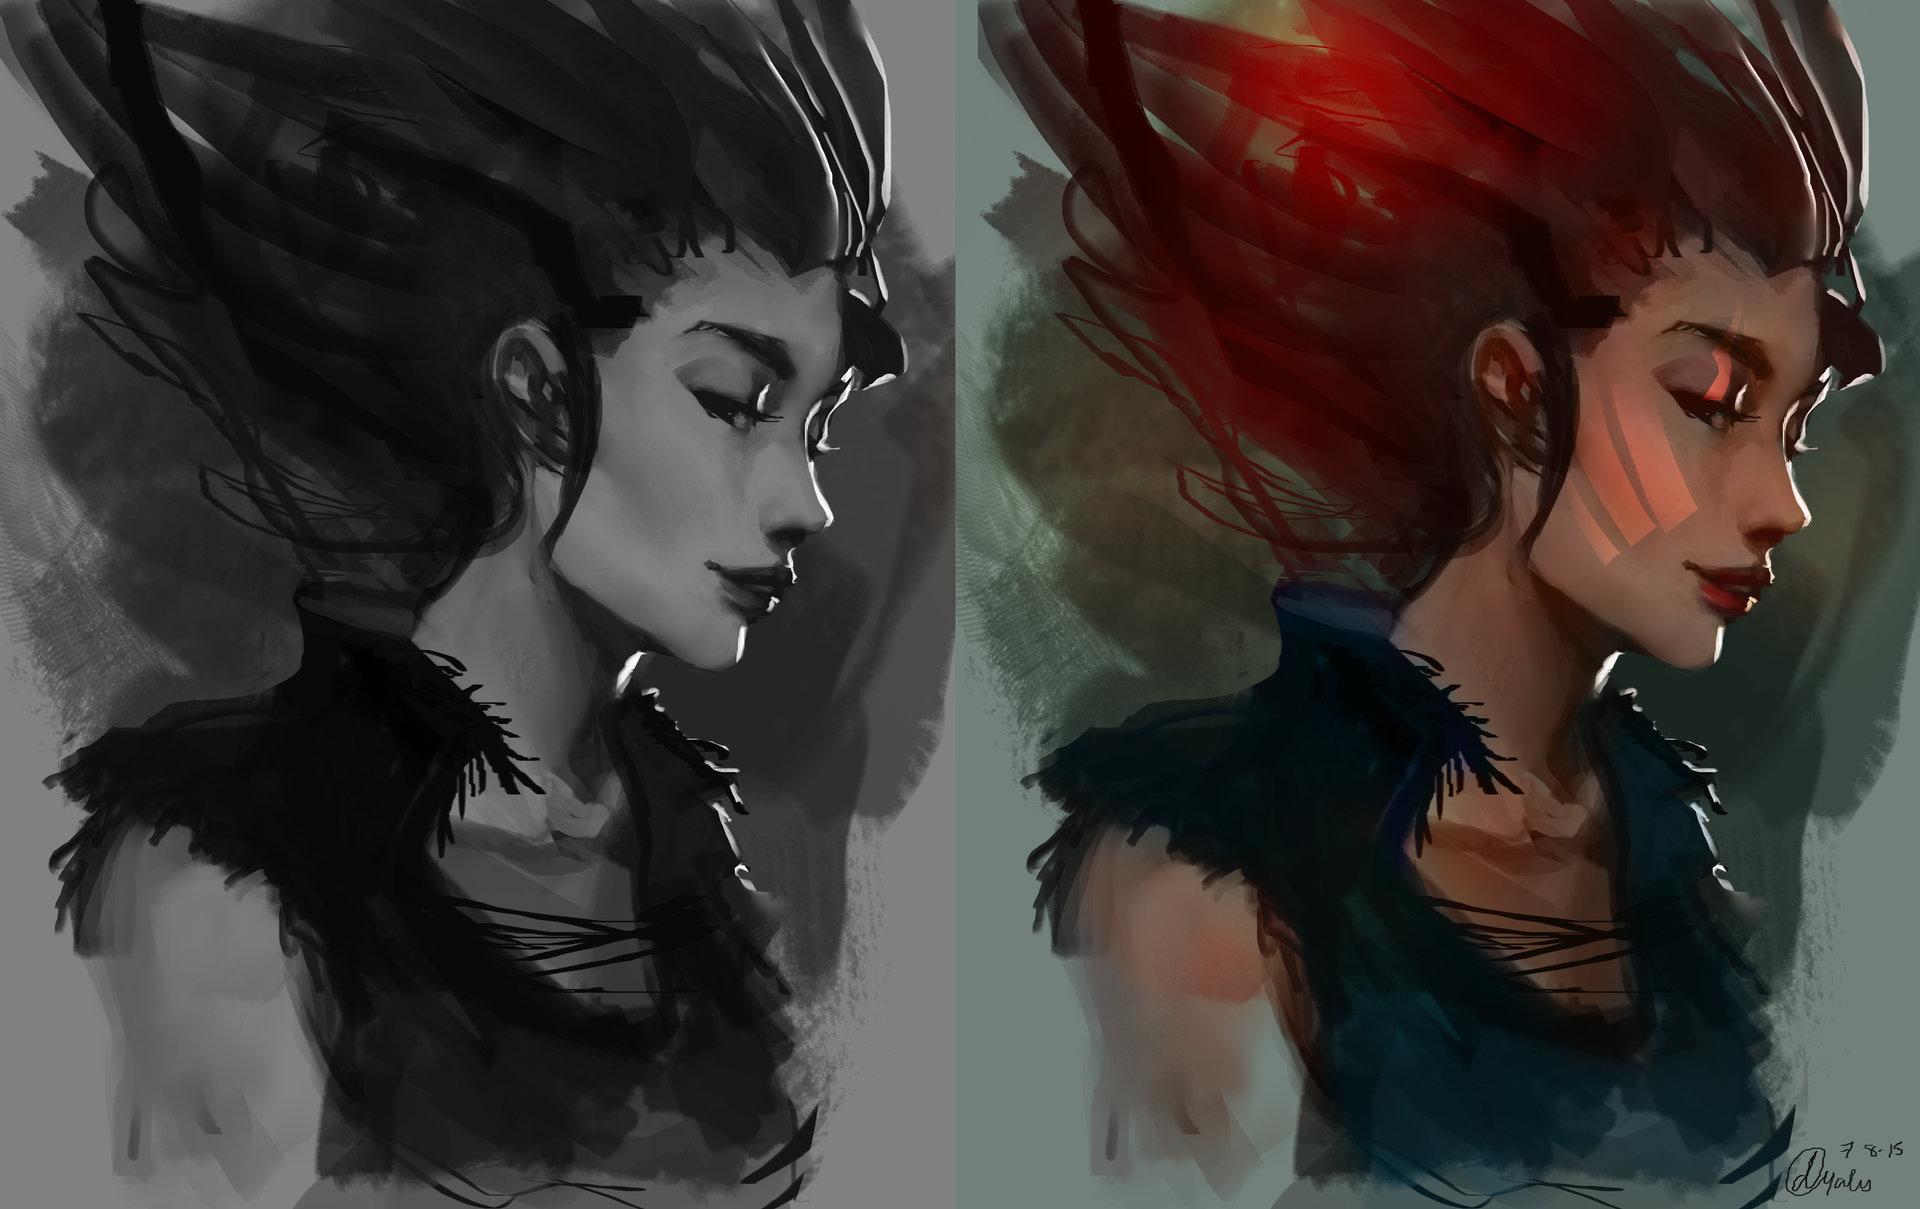 Concept art девушки панка, концепт арт от danielle oyales